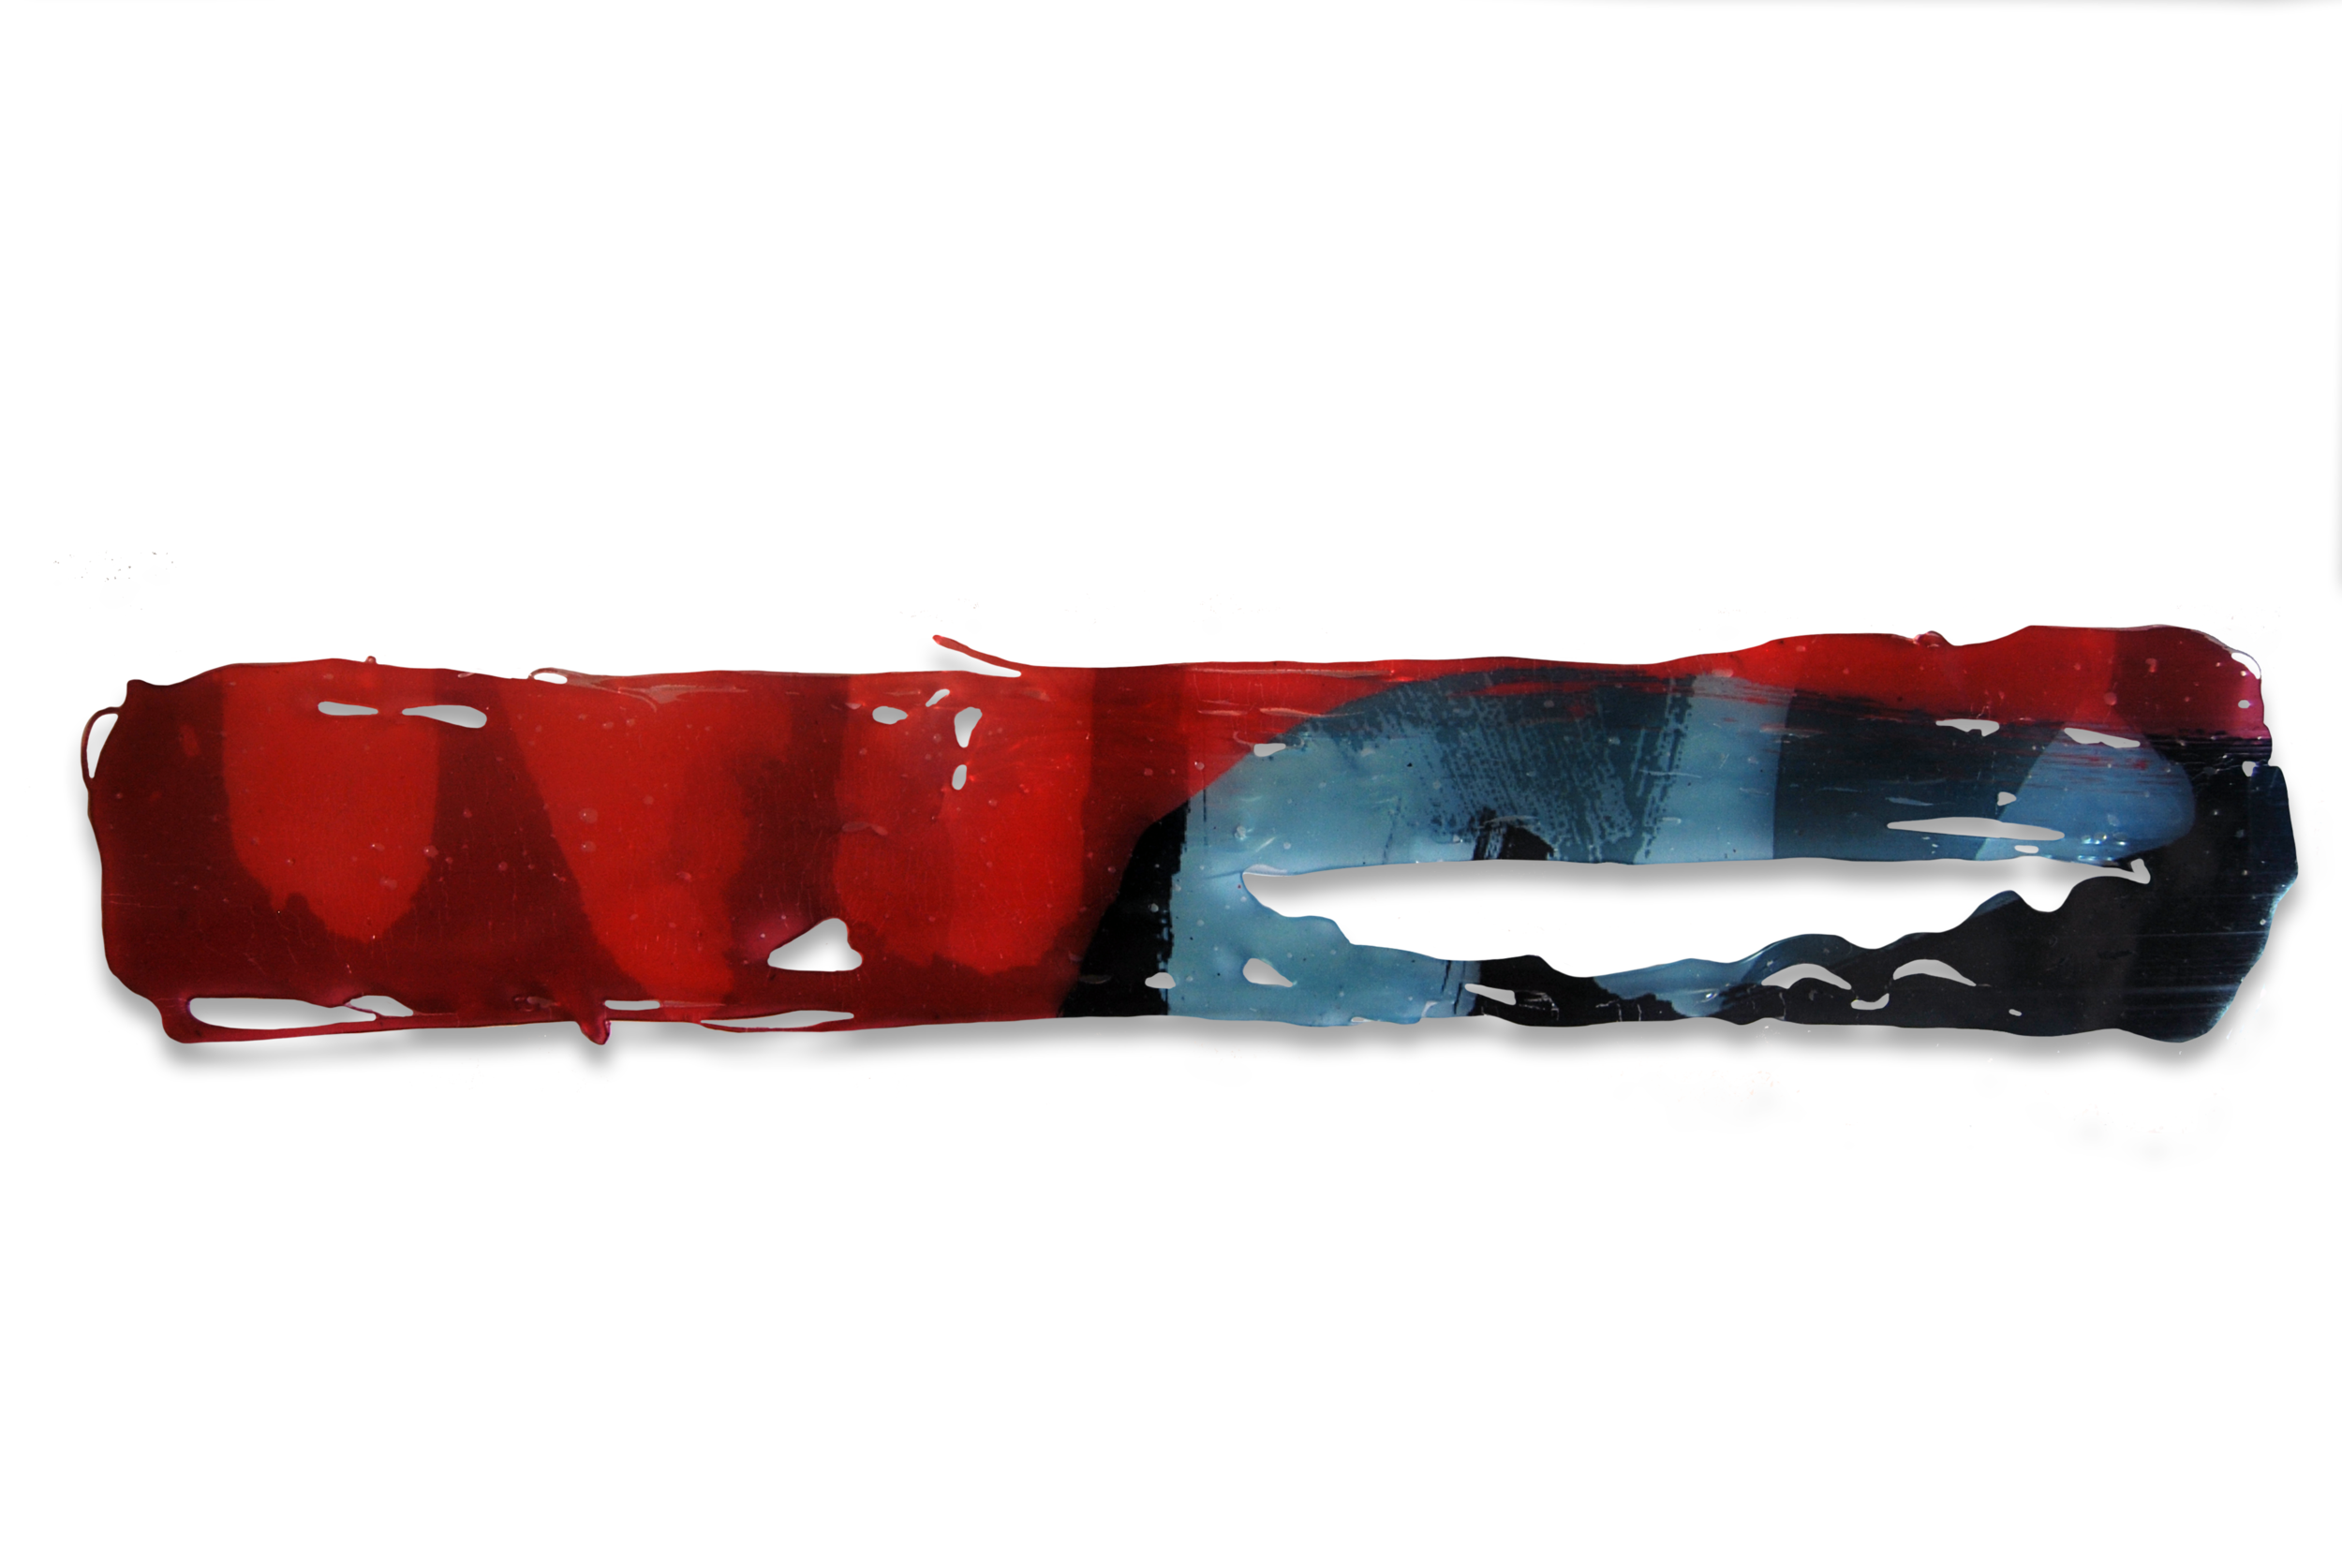 Transfer nº6, 2015, Transferencia Digital sobre cola Termofusible. 7,5 x 39 cm